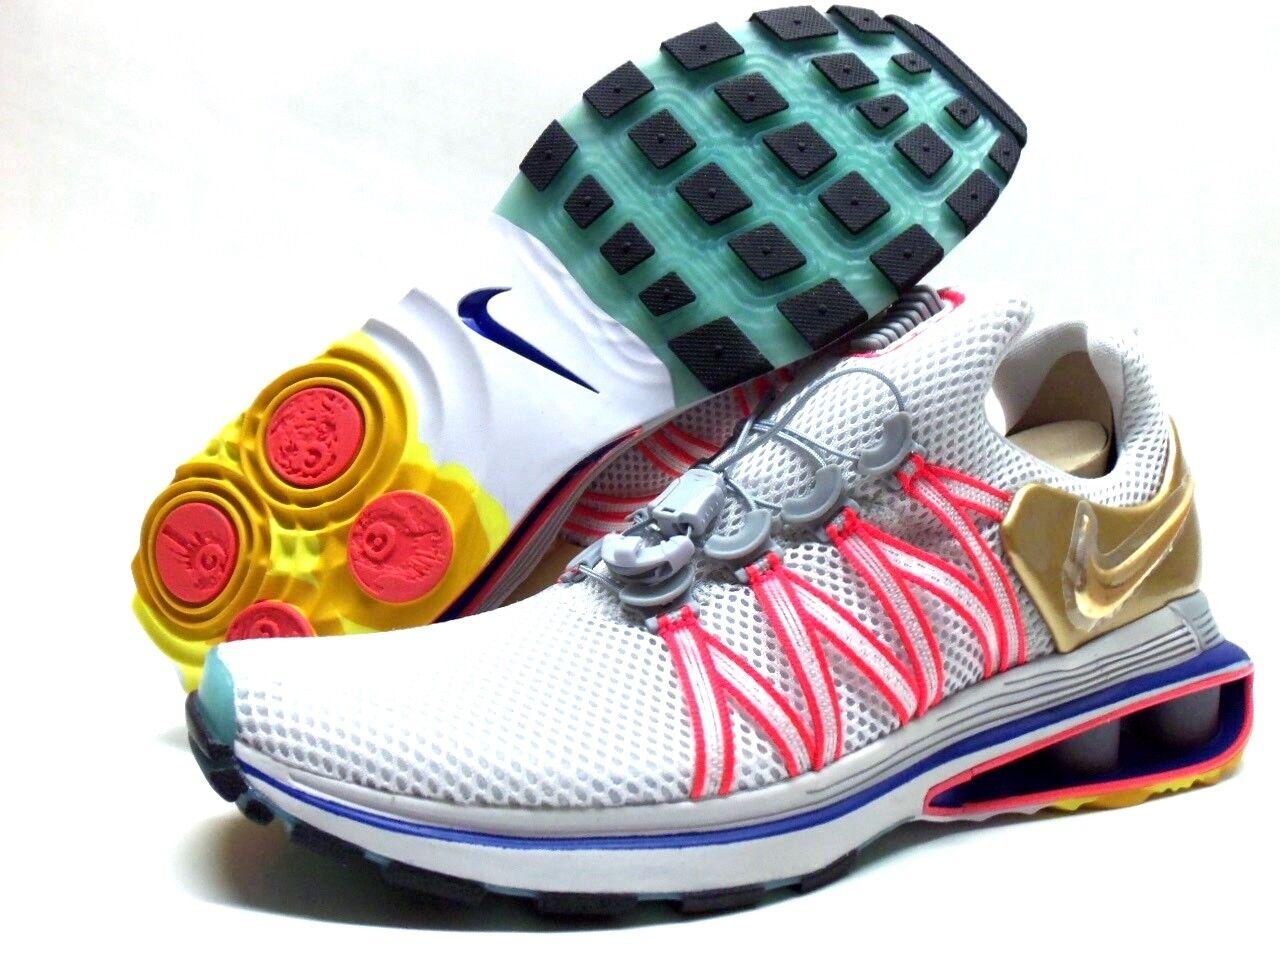 Nike shox schwerkraft riesige graue / metallisches metallisches metallisches gold größe der männer 9 [aq8553-009] ddc7ec